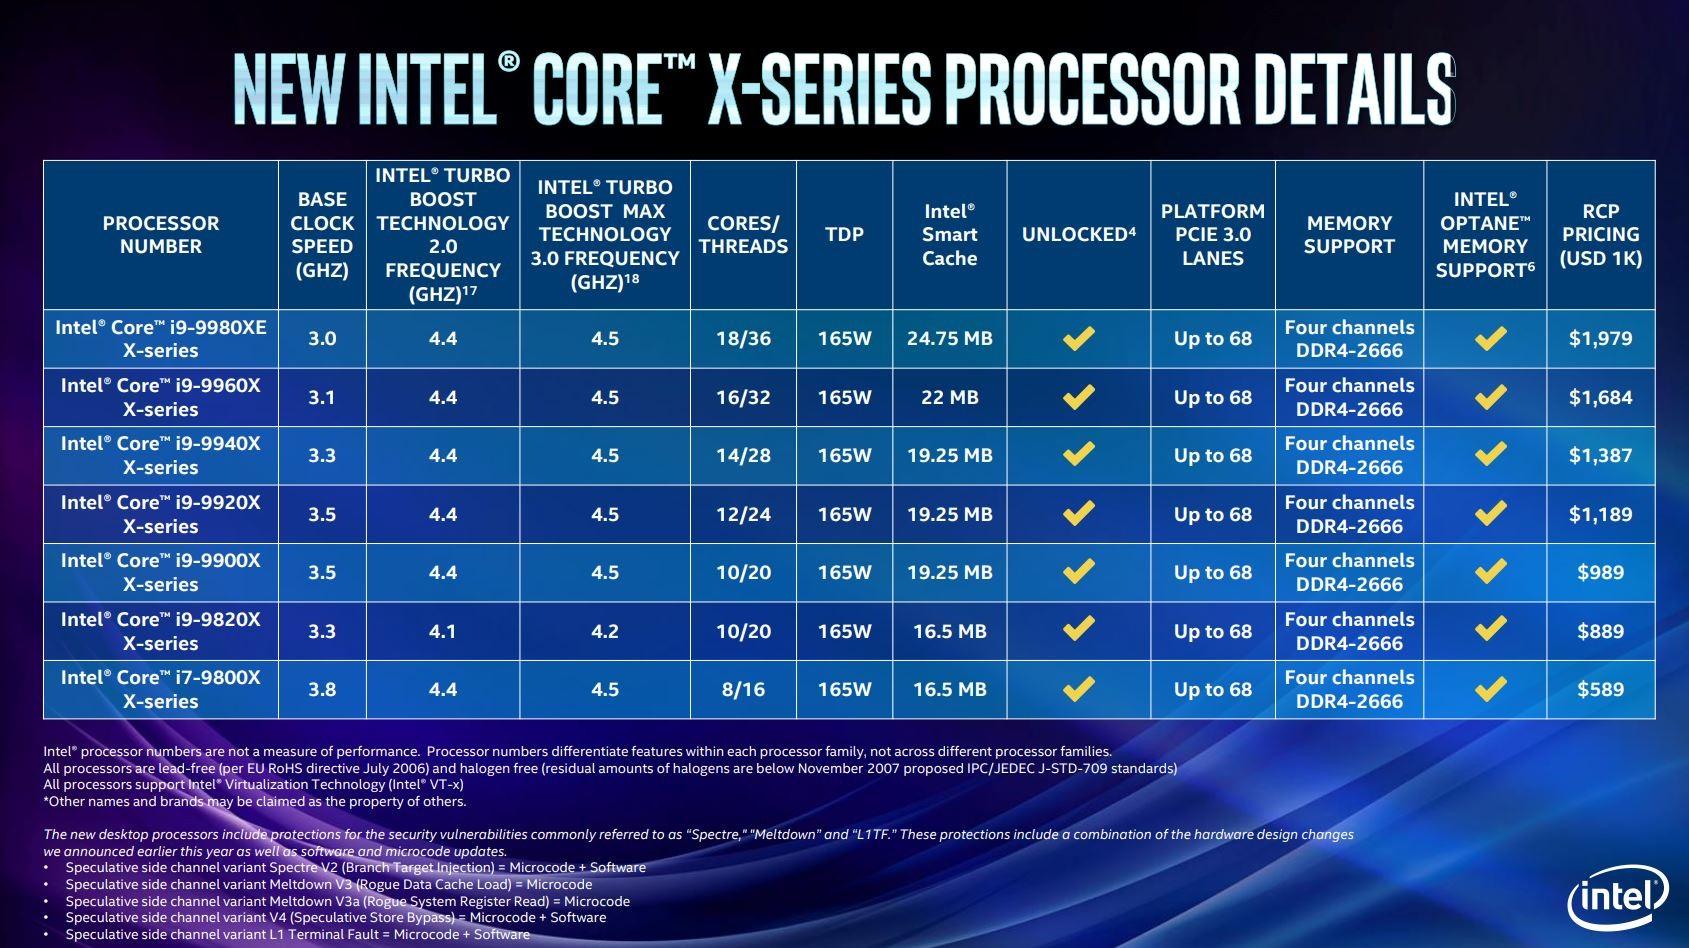 Intel announces a 28-core Xeon processor and 18-core X-series CPUs